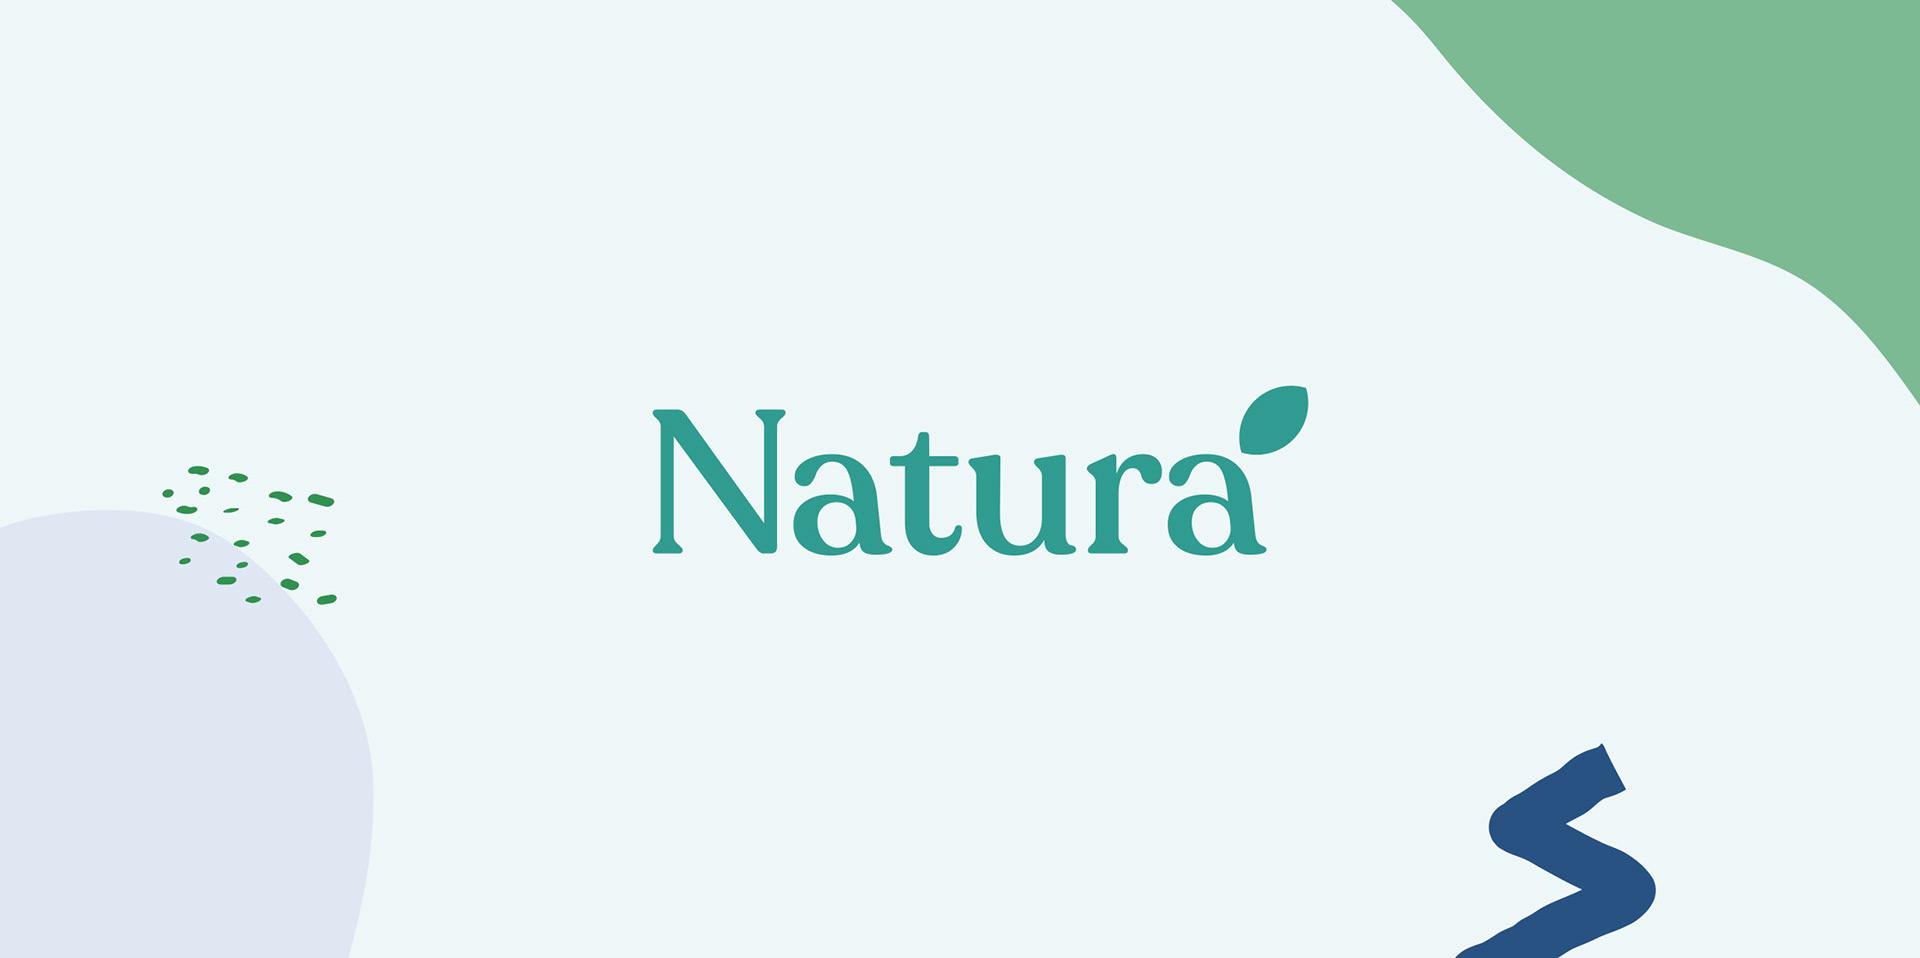 Natura Branding and Packaging Design